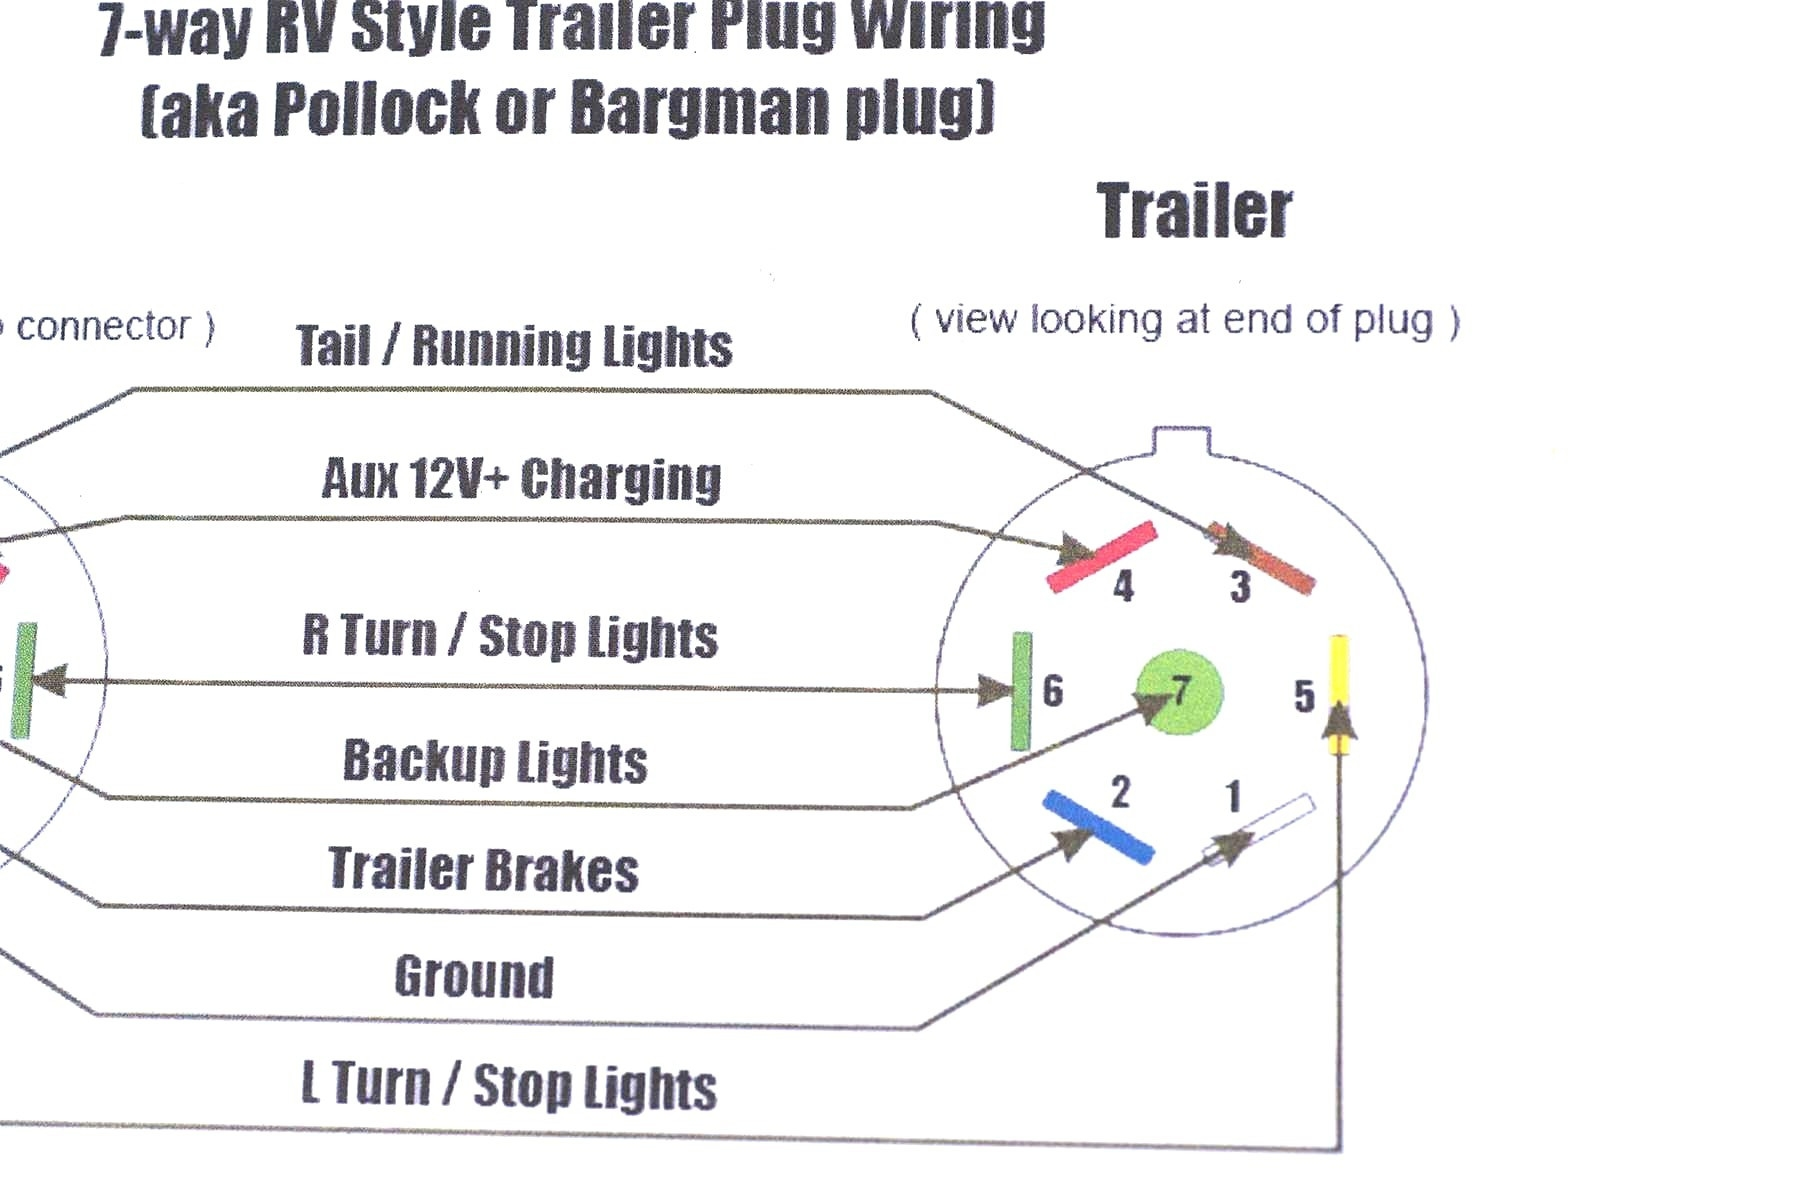 Hopkins 7 Blade Trailer Wiring Diagram